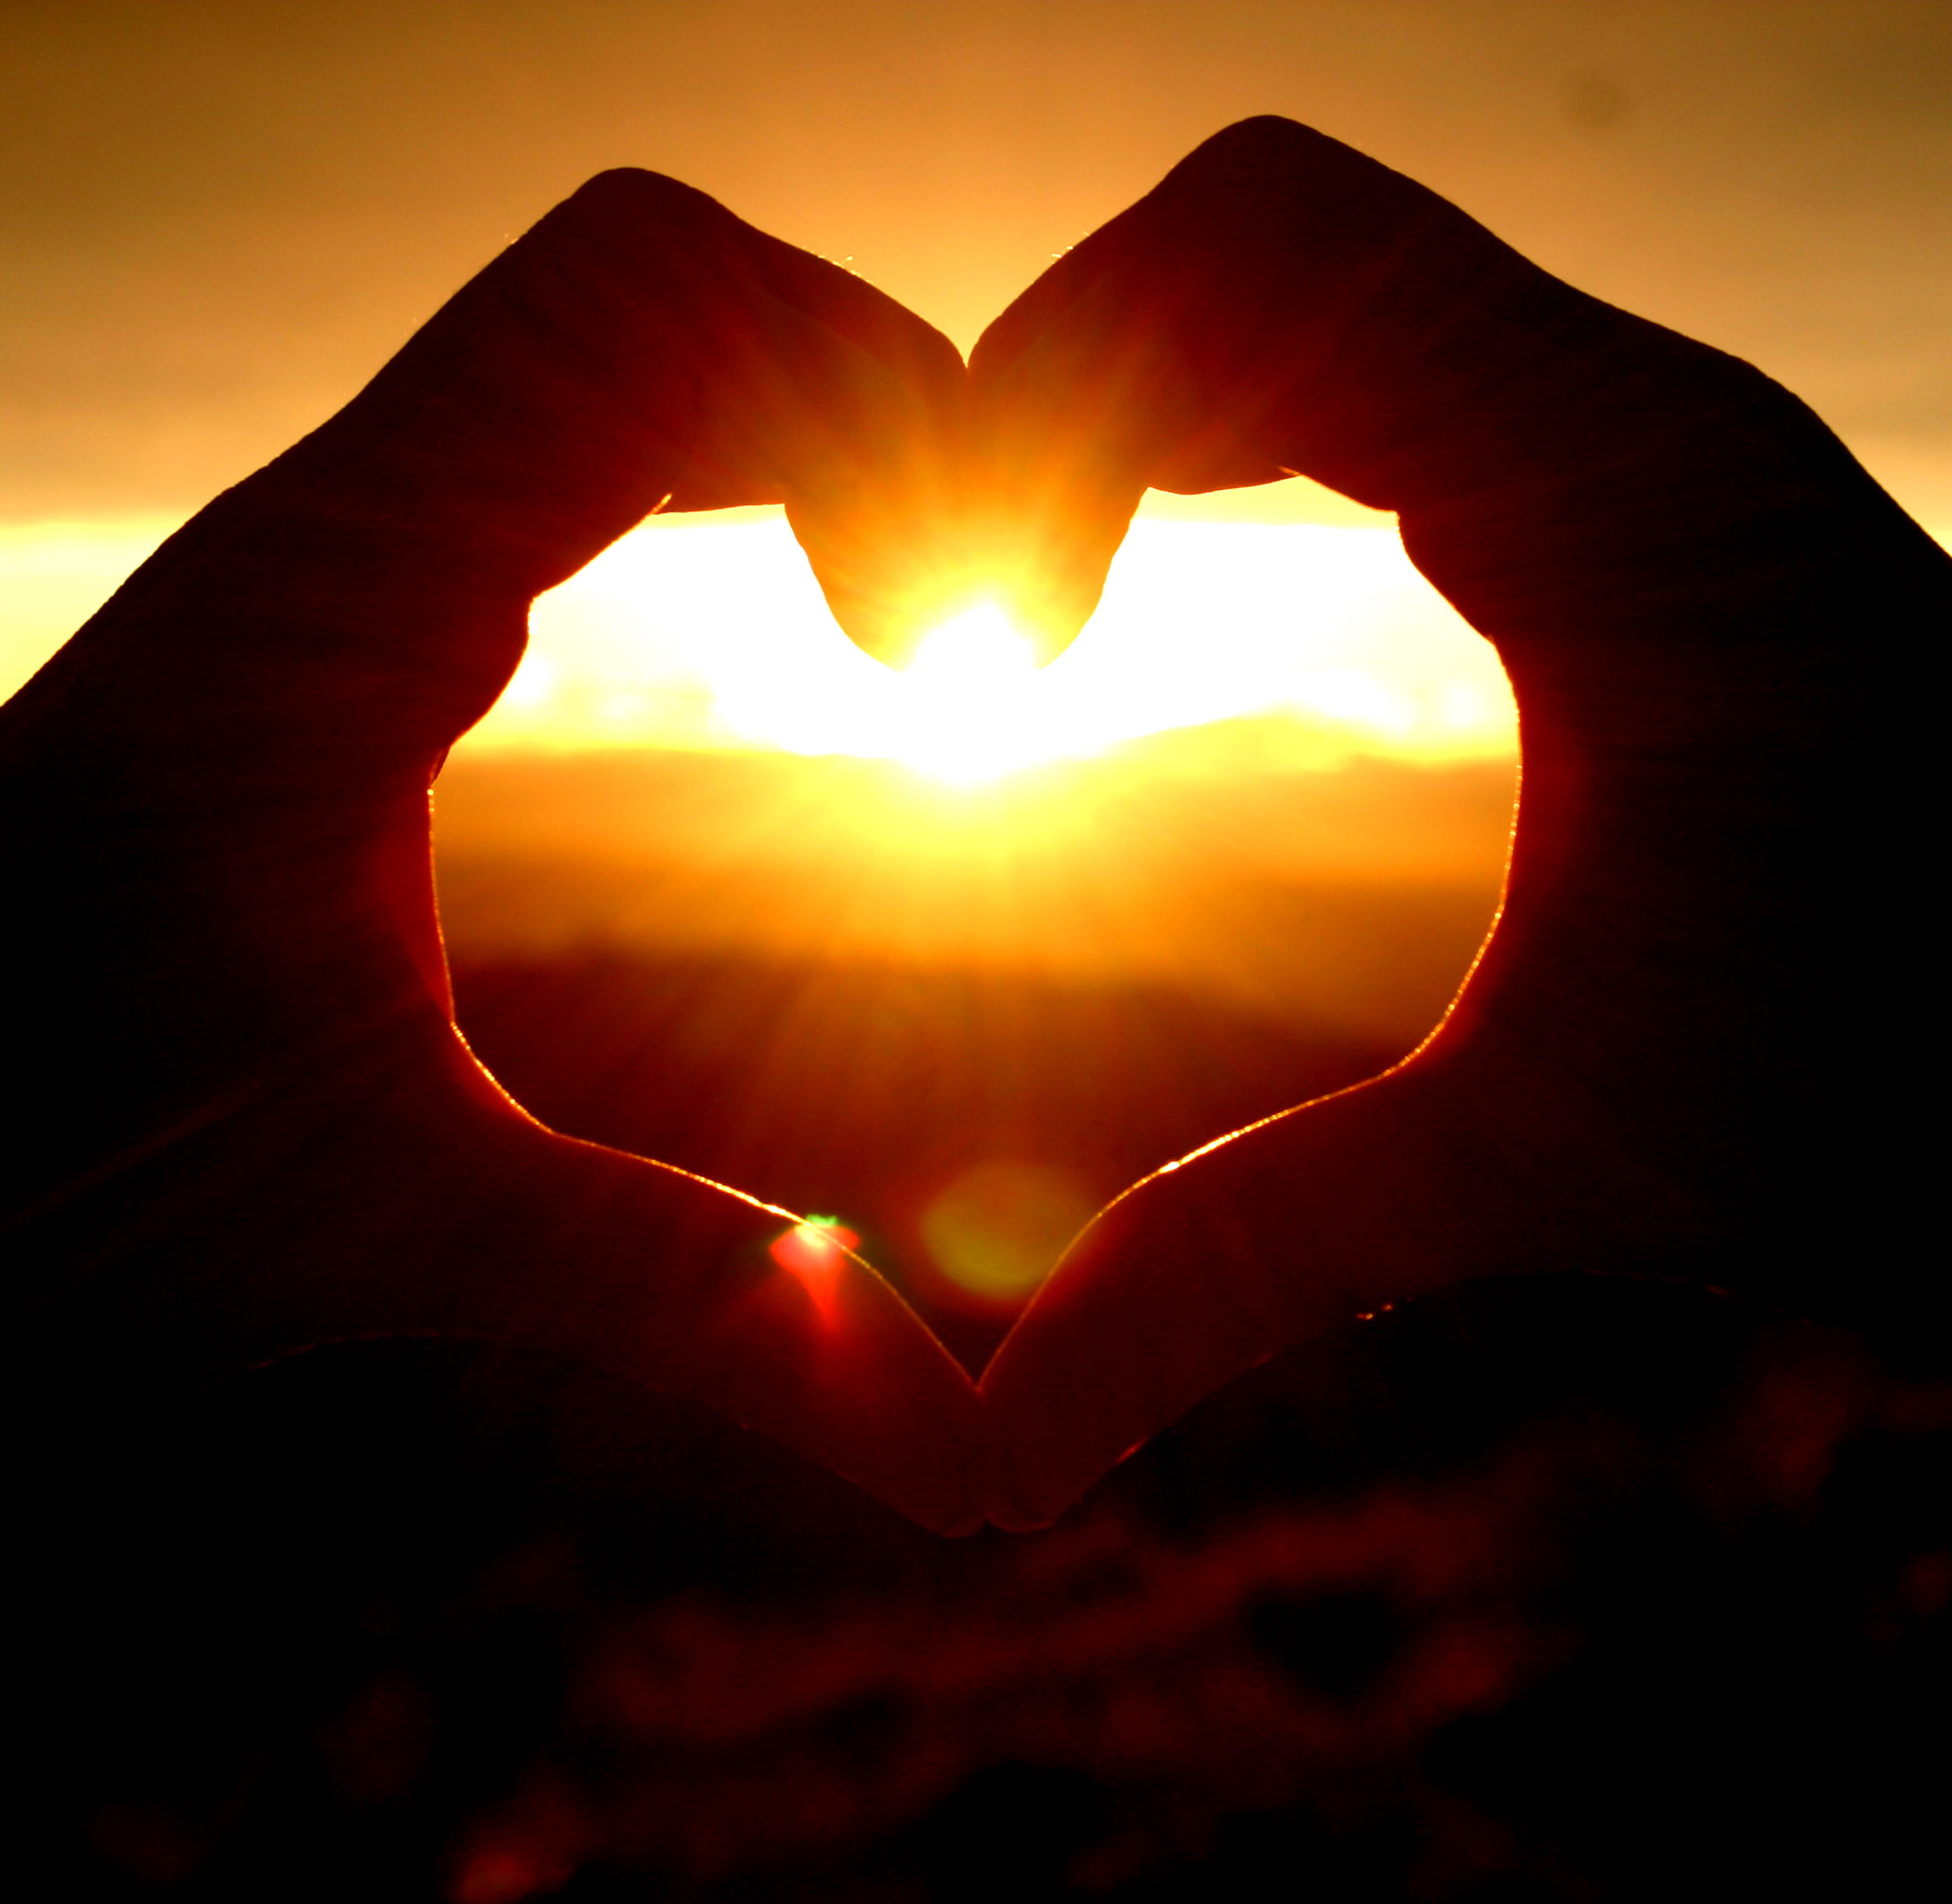 картинки солнечное сердце весьма